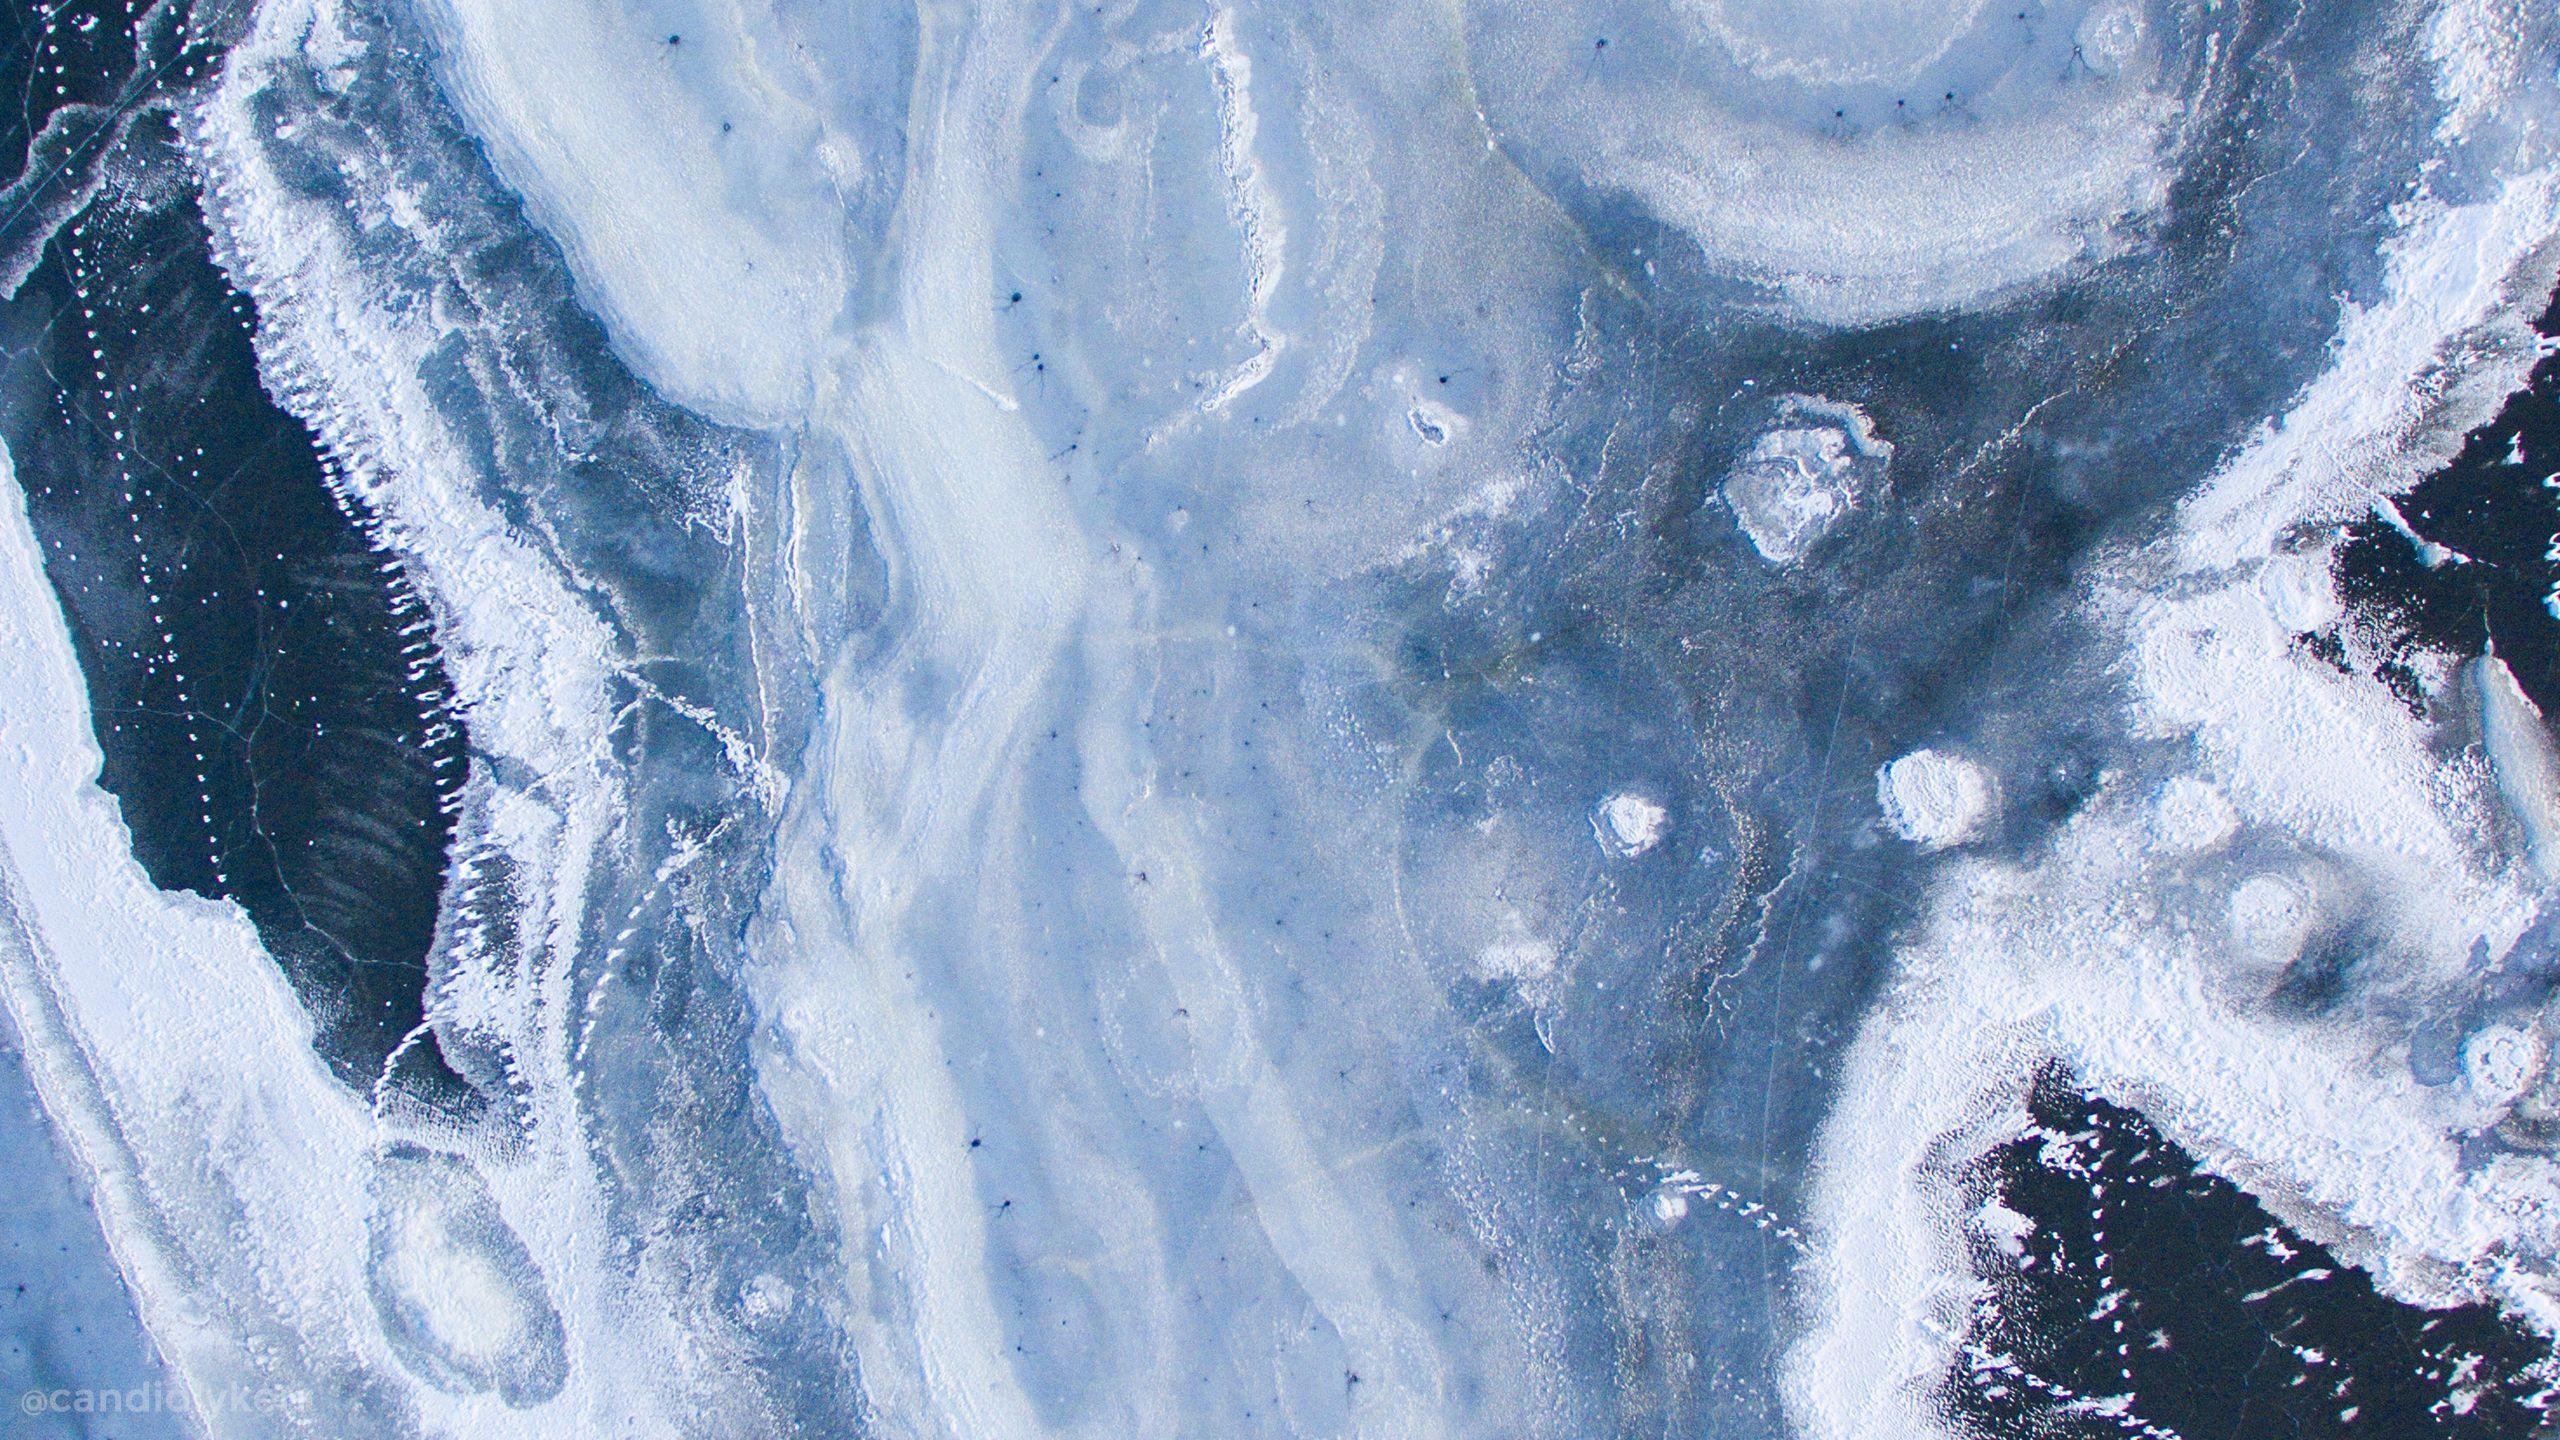 Macbook Blue Aesthetics Wallpapers Wallpaper Cave